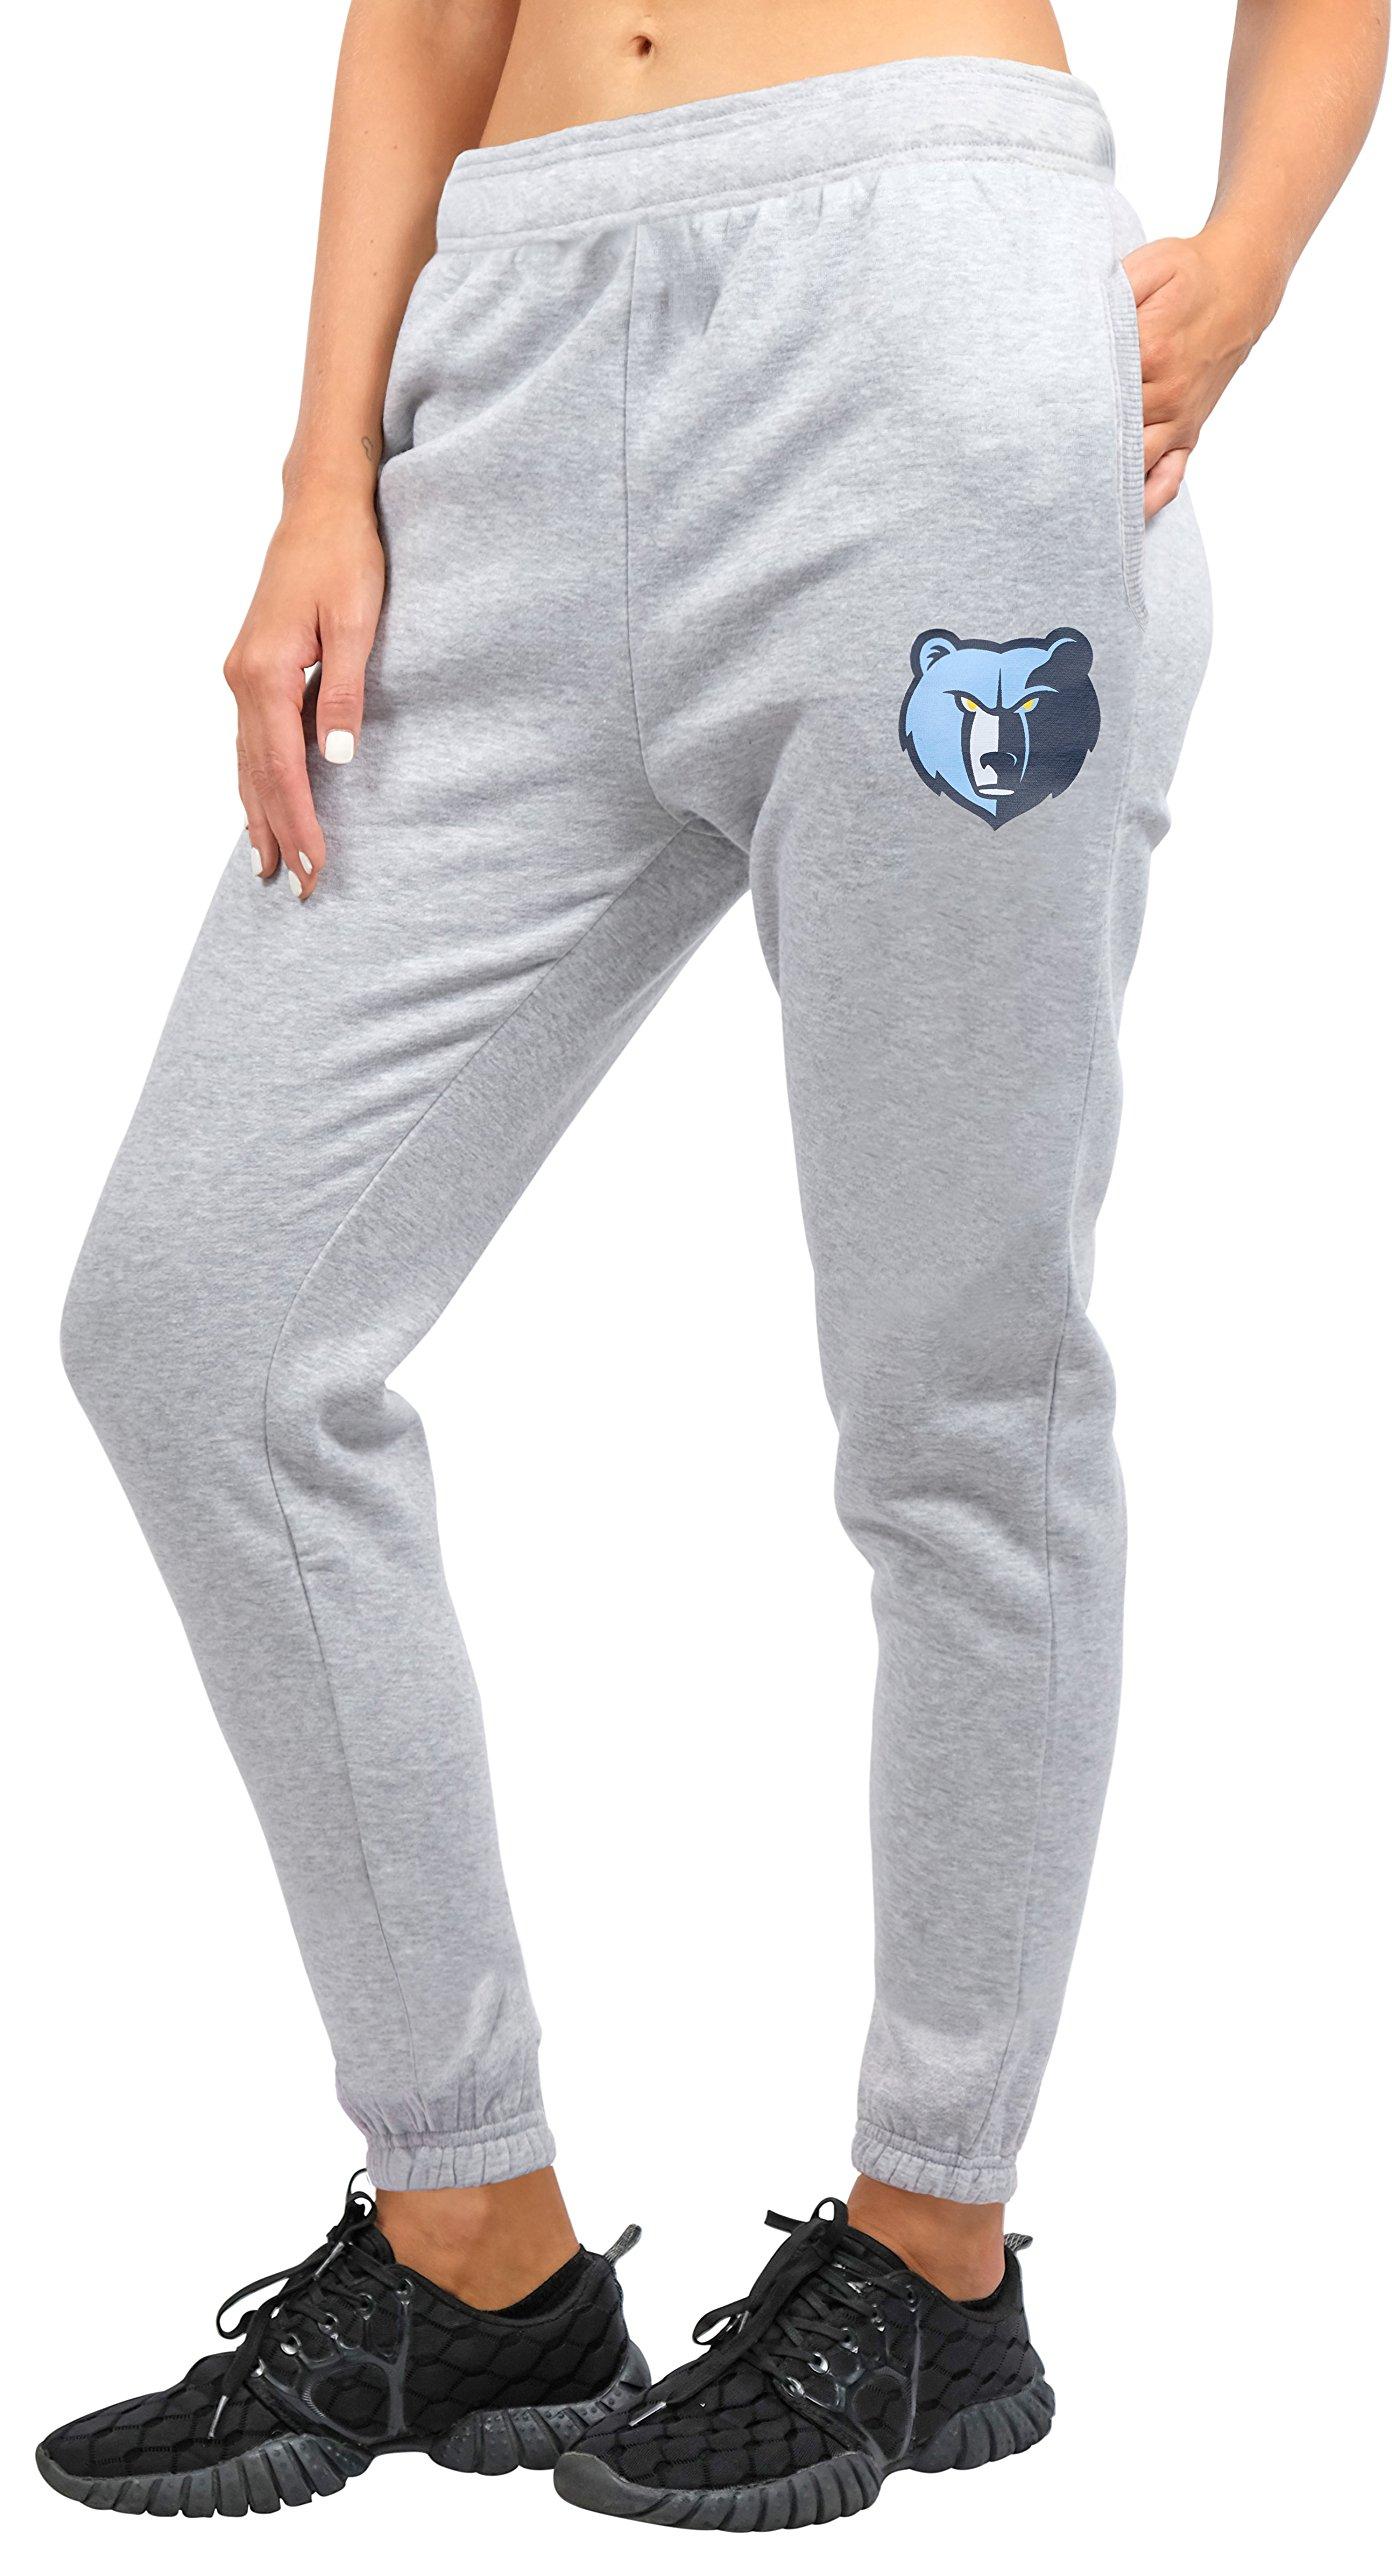 NBA Memphis Grizzlies Women's Jogger Pants Active Logo Fleece Sweatpants, Small, Gray